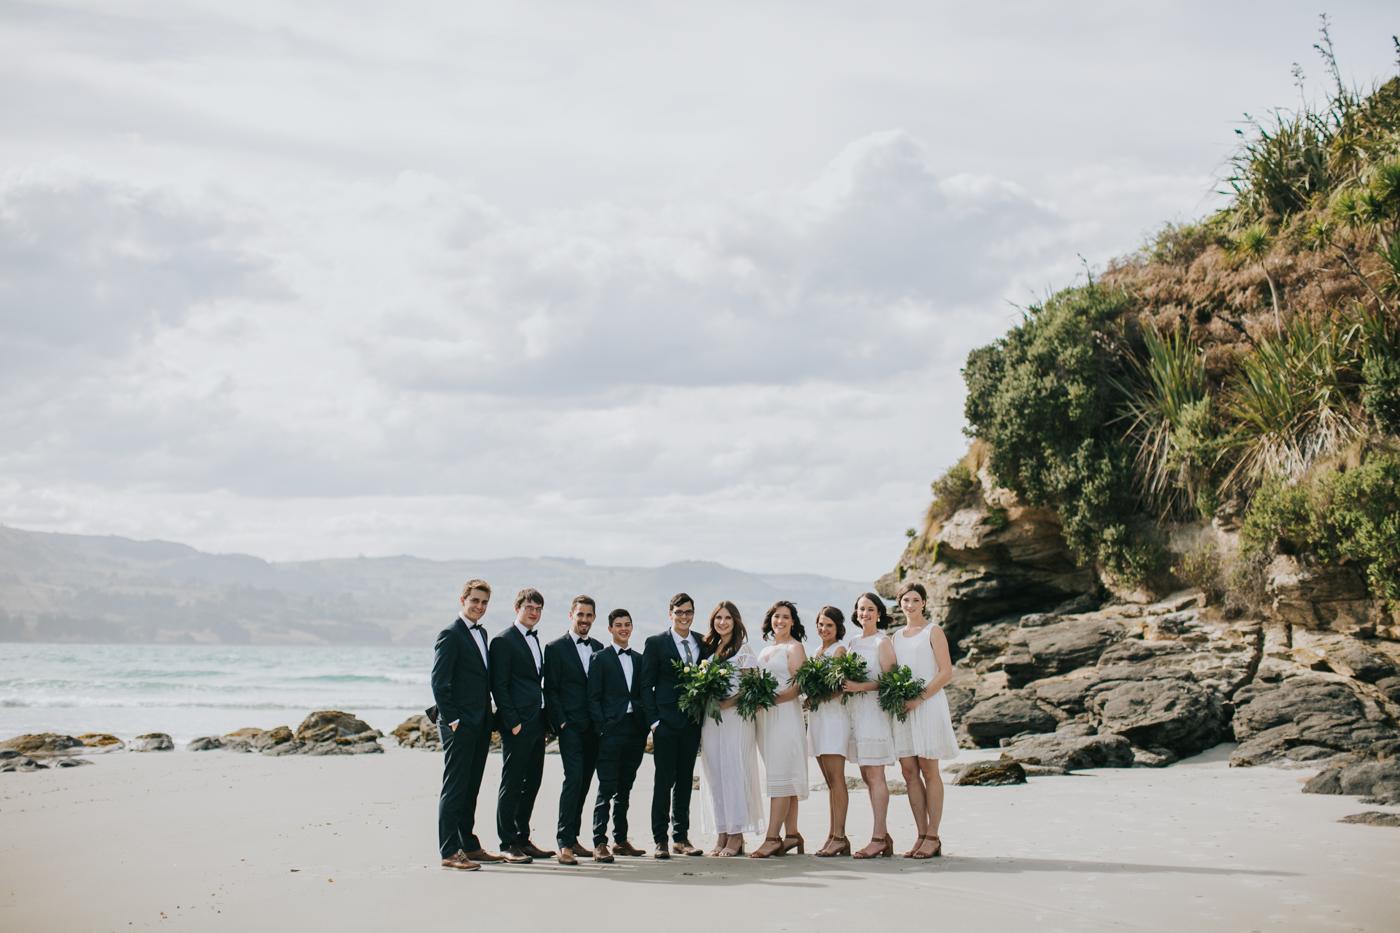 Ariana & Tim - Dunedin, New Zealand Wedding - Destination Wedding - Samantha Heather Photography-119.jpg